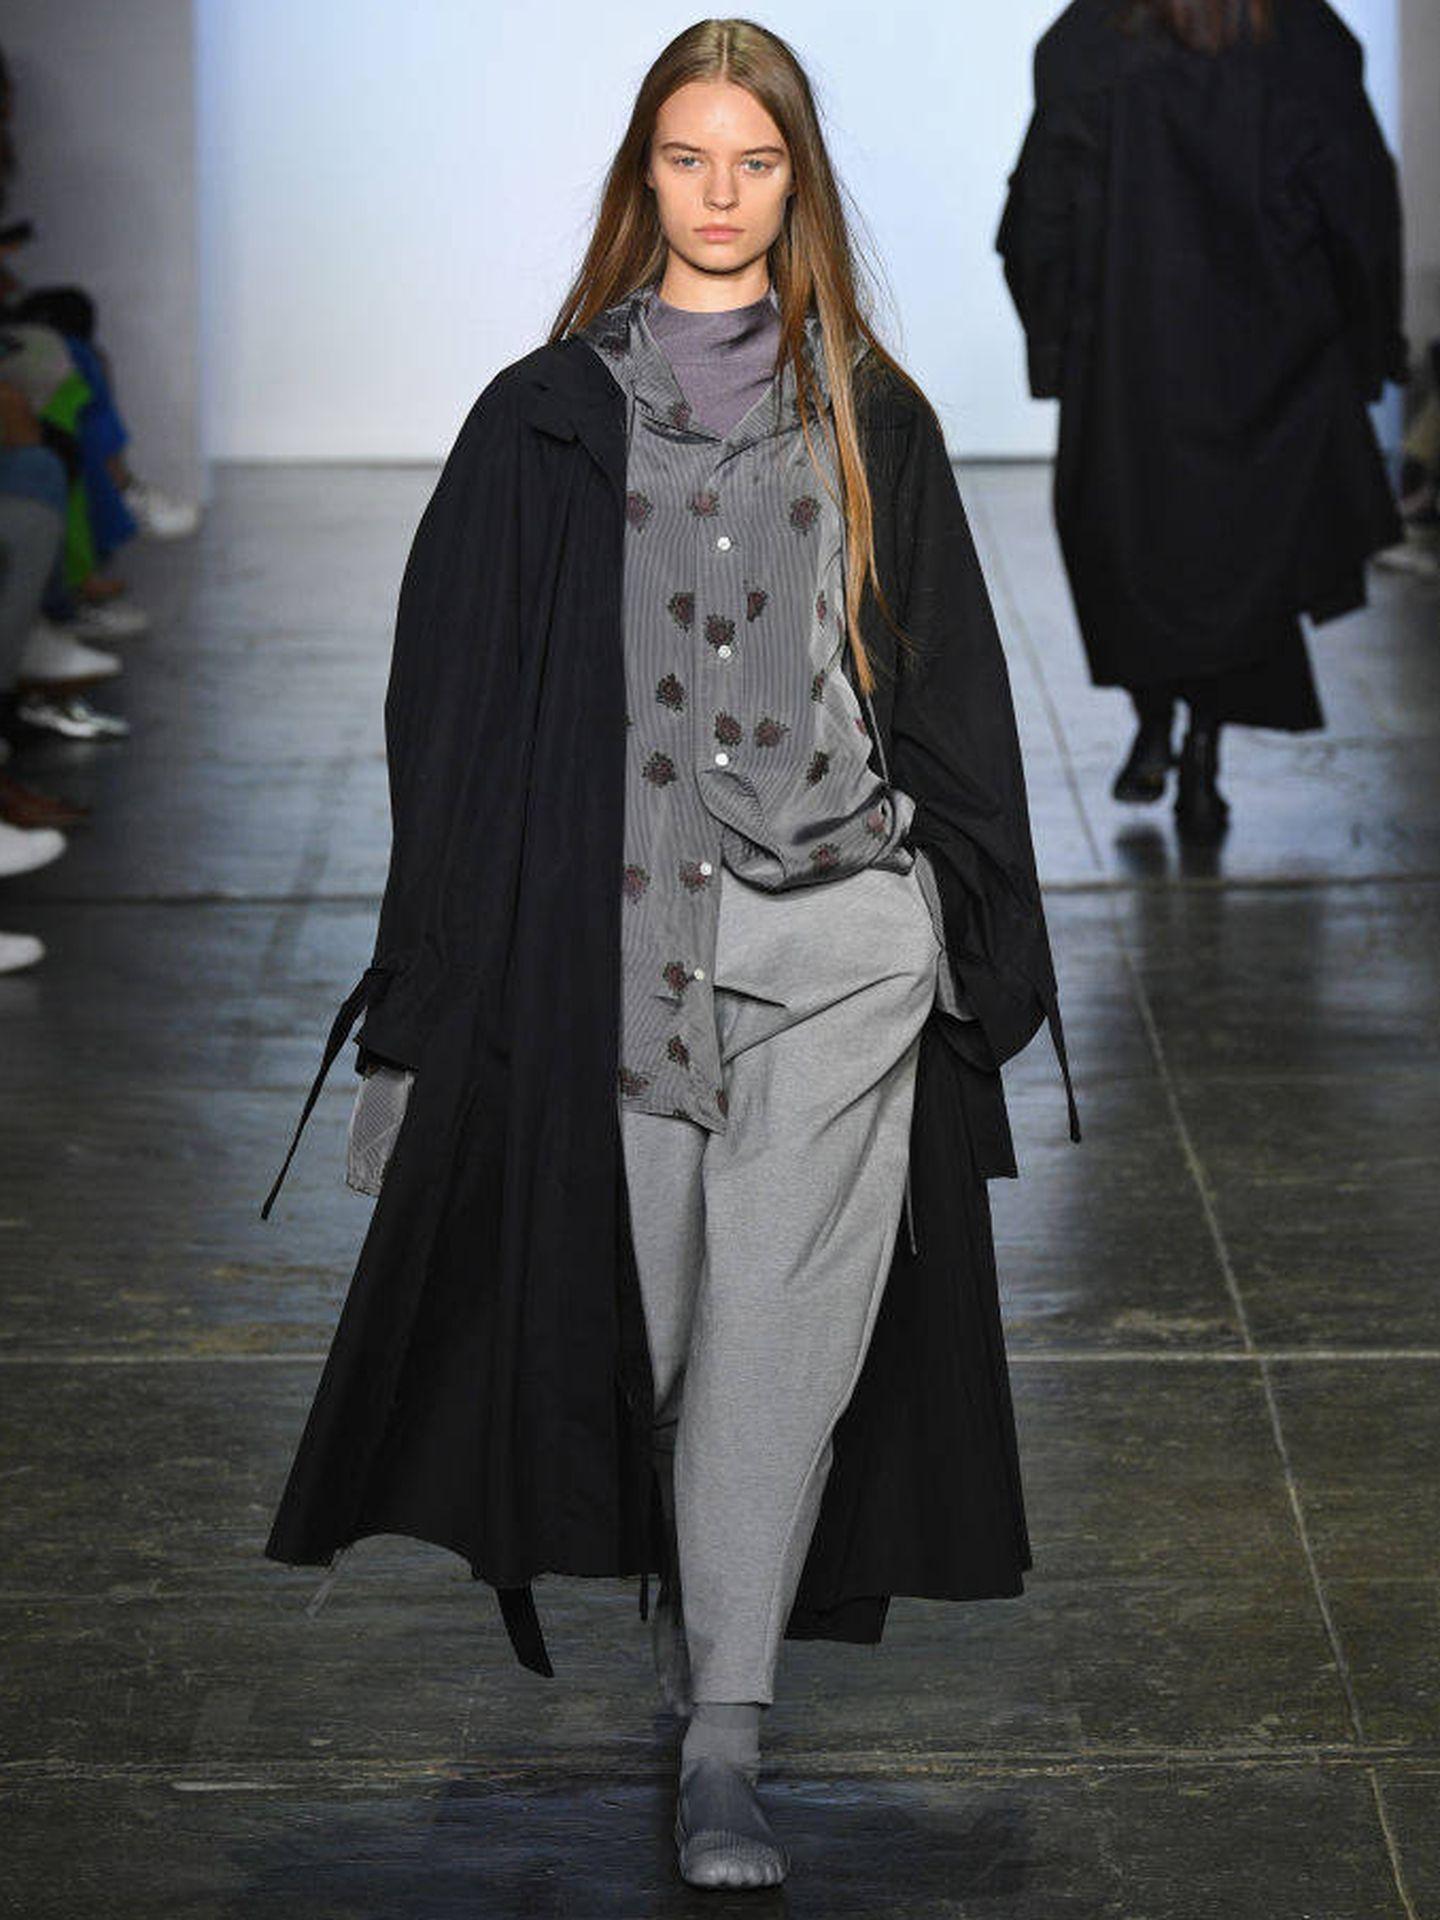 Modelo con prendas 'oversize' en la New York Fashion Week (Slaven Vlasic/Getty Images).